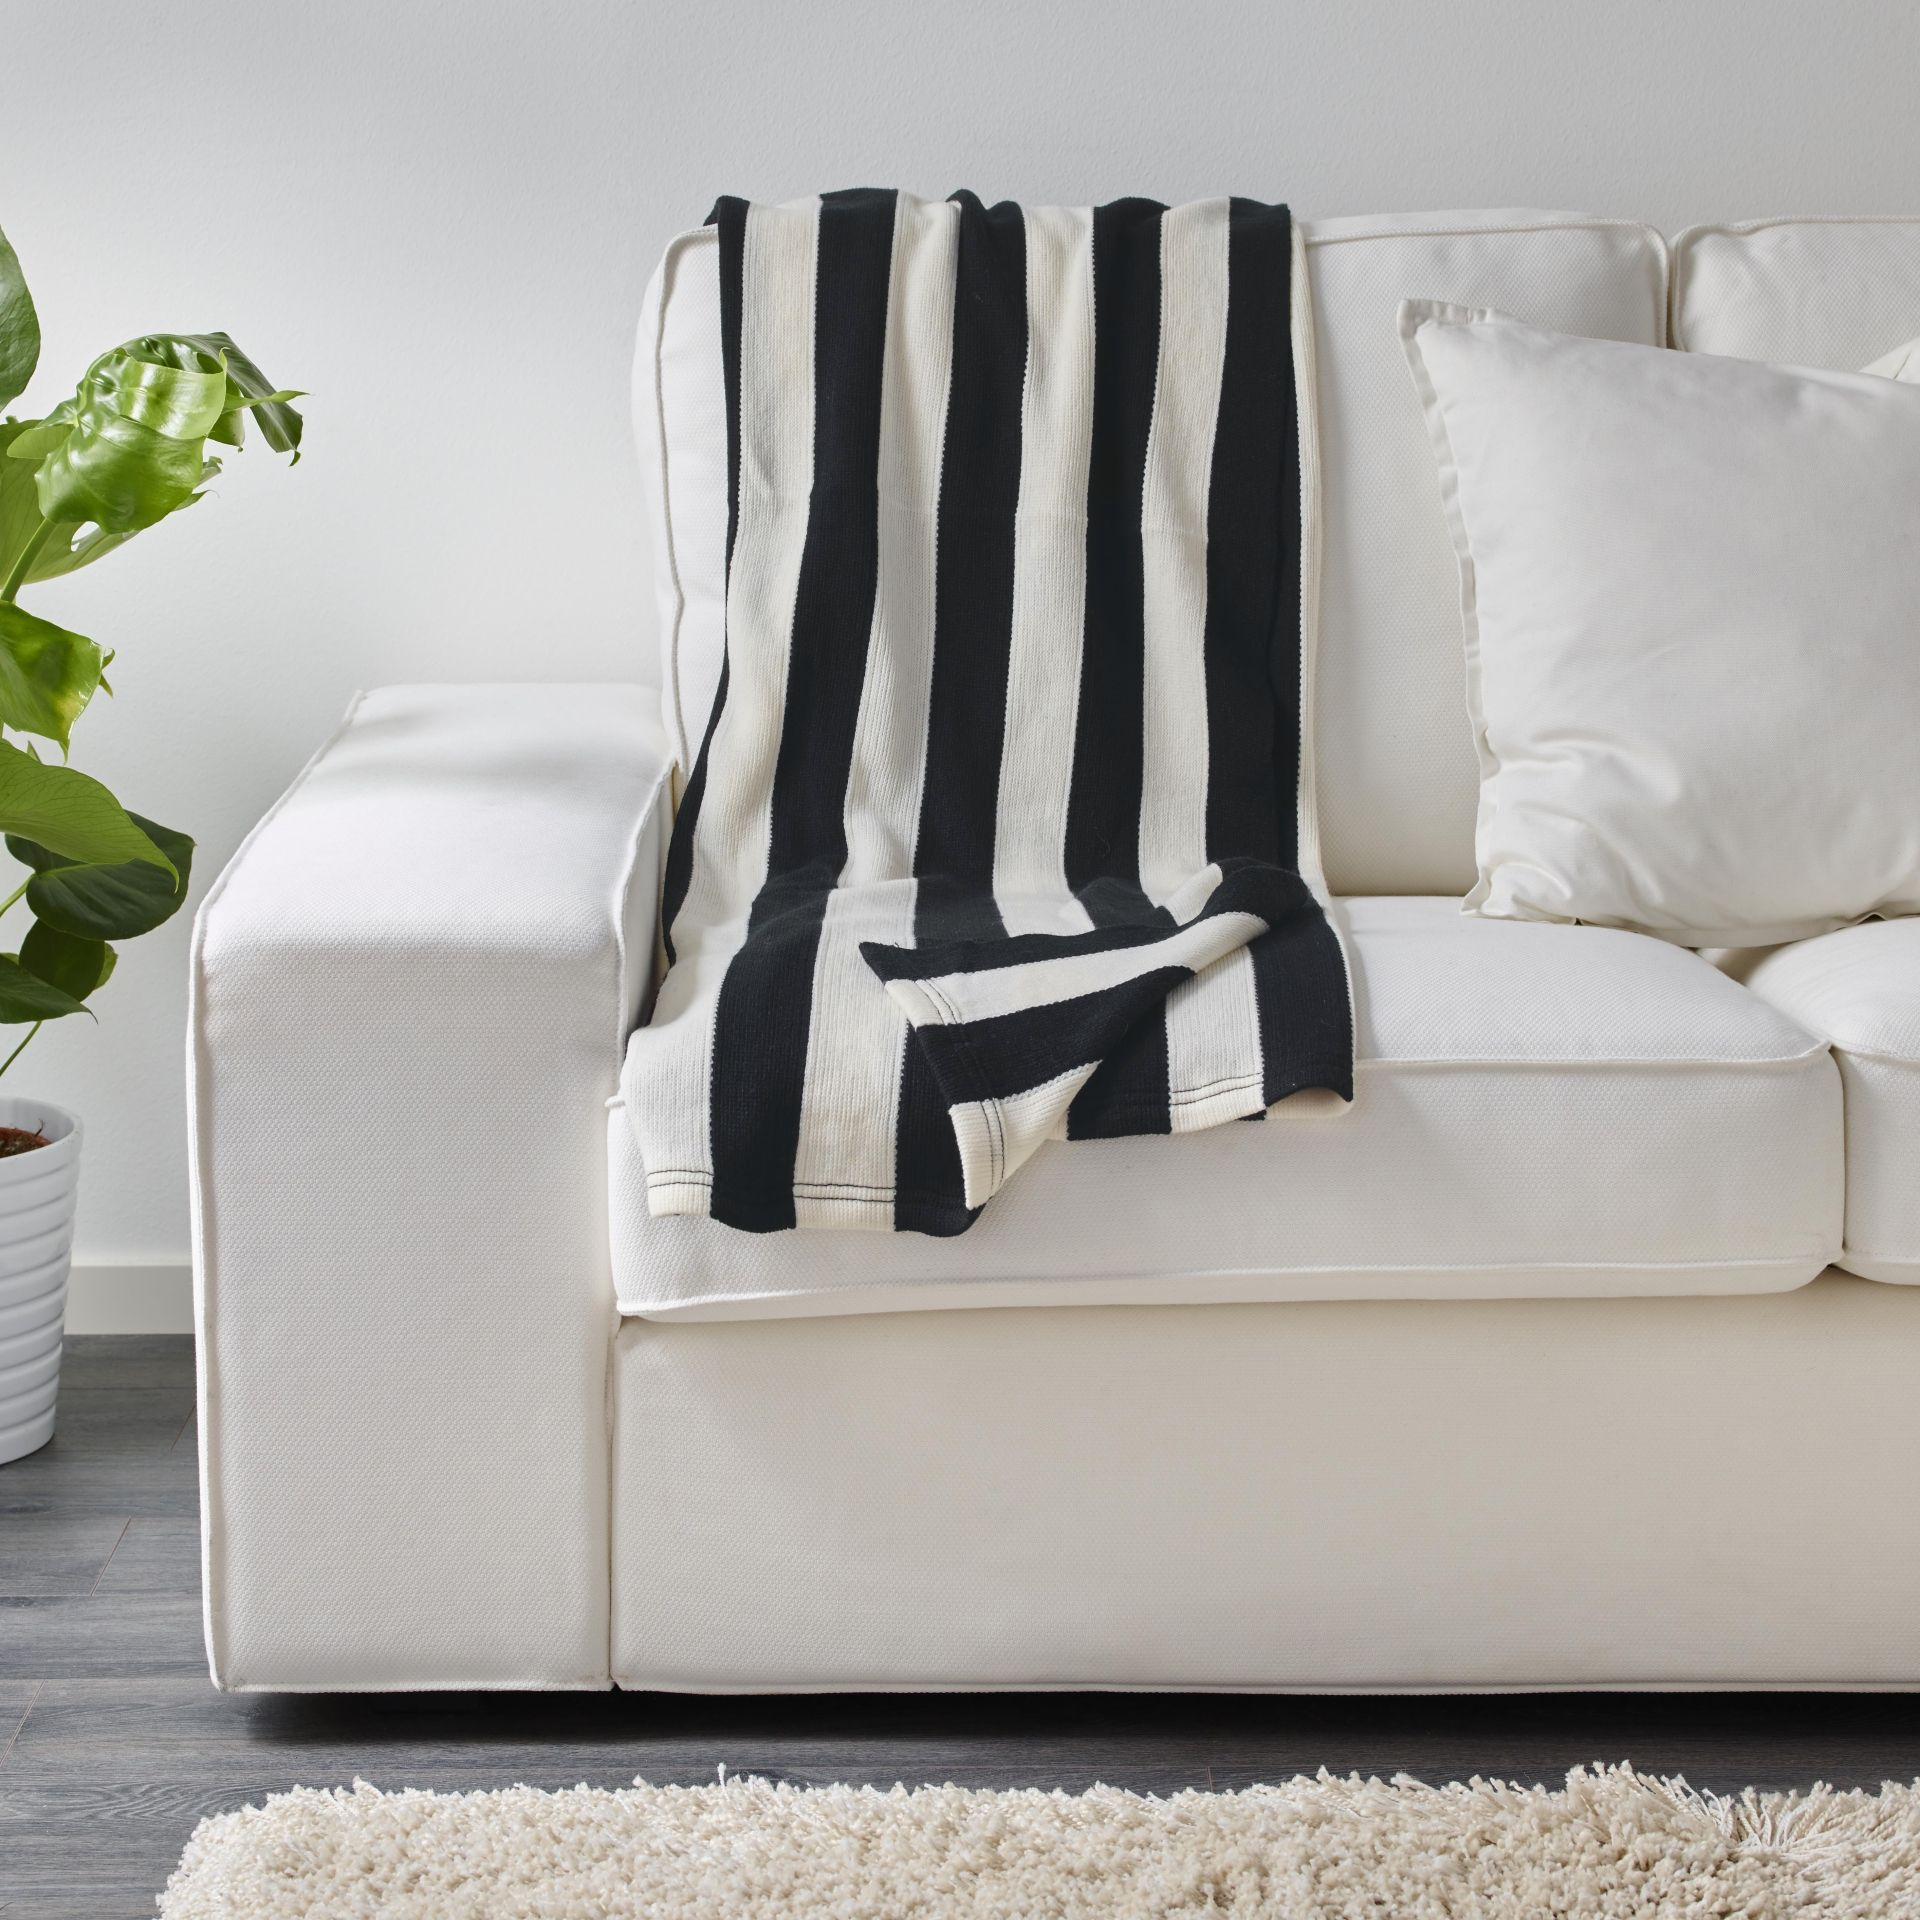 EIVOR plaid | IKEA IKEAnl IKEAnederland inspiratie wooninspiratie ...